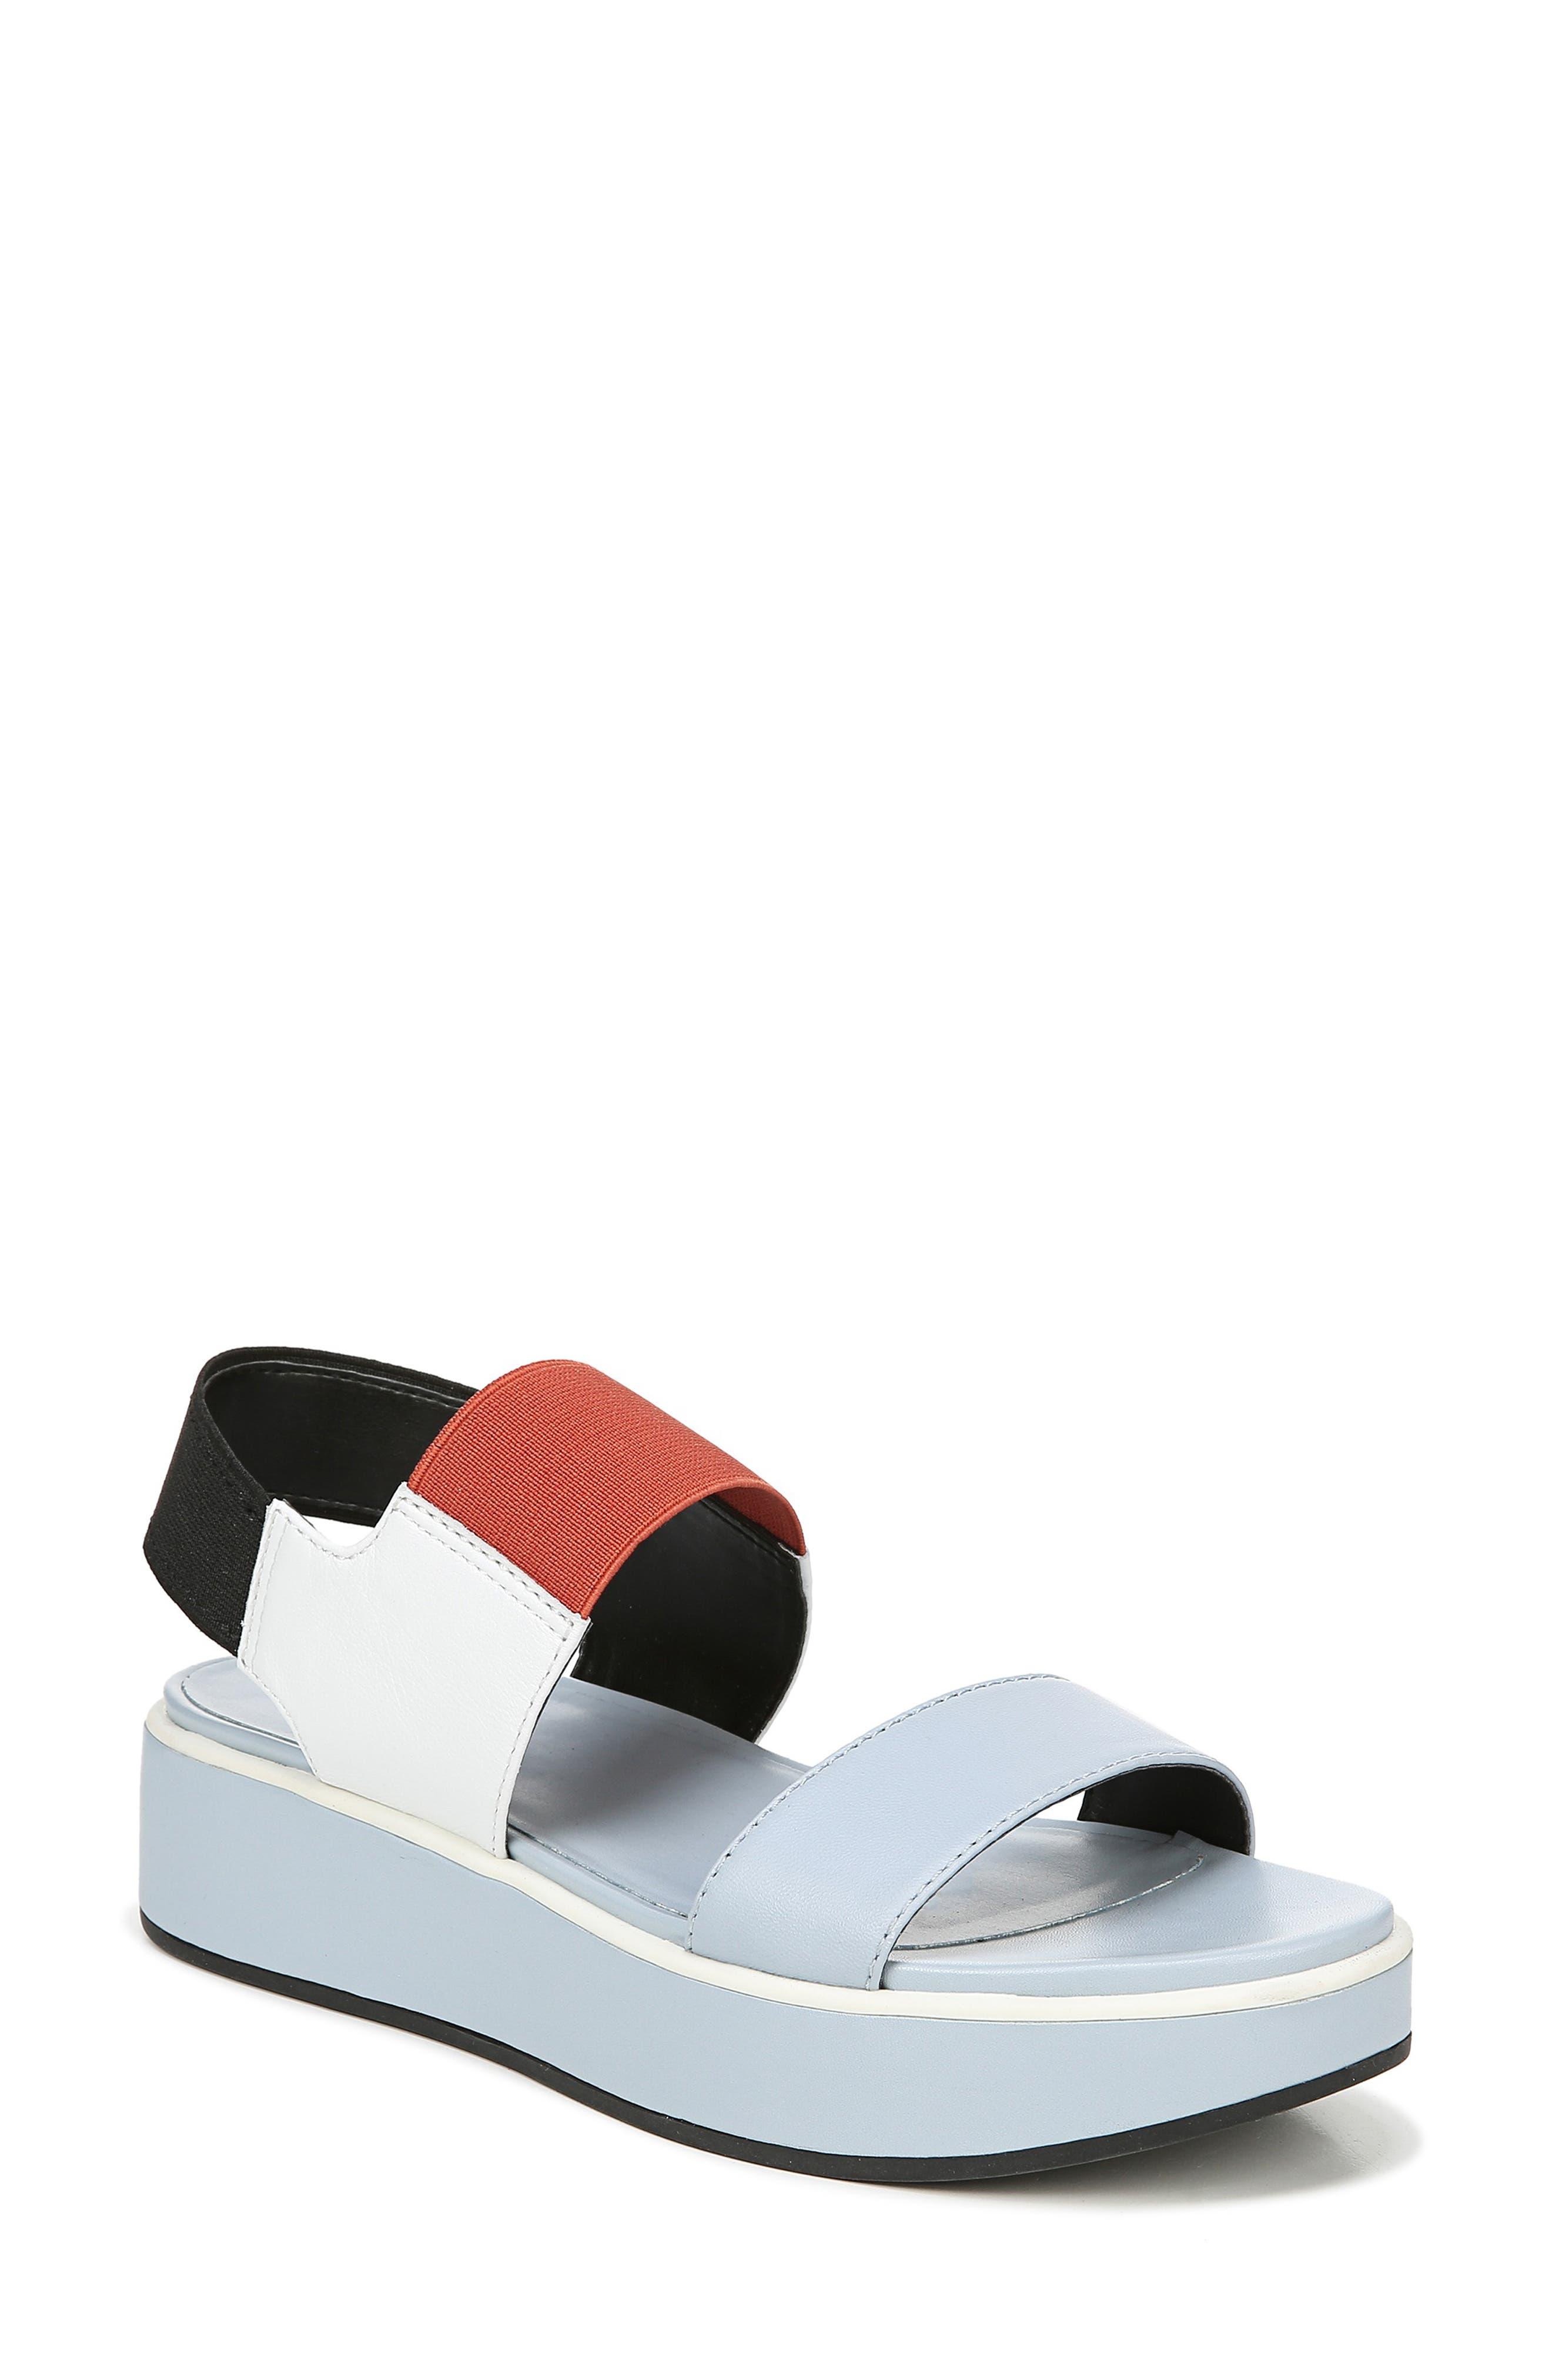 Naturalizer Carys Platform Sandal, White